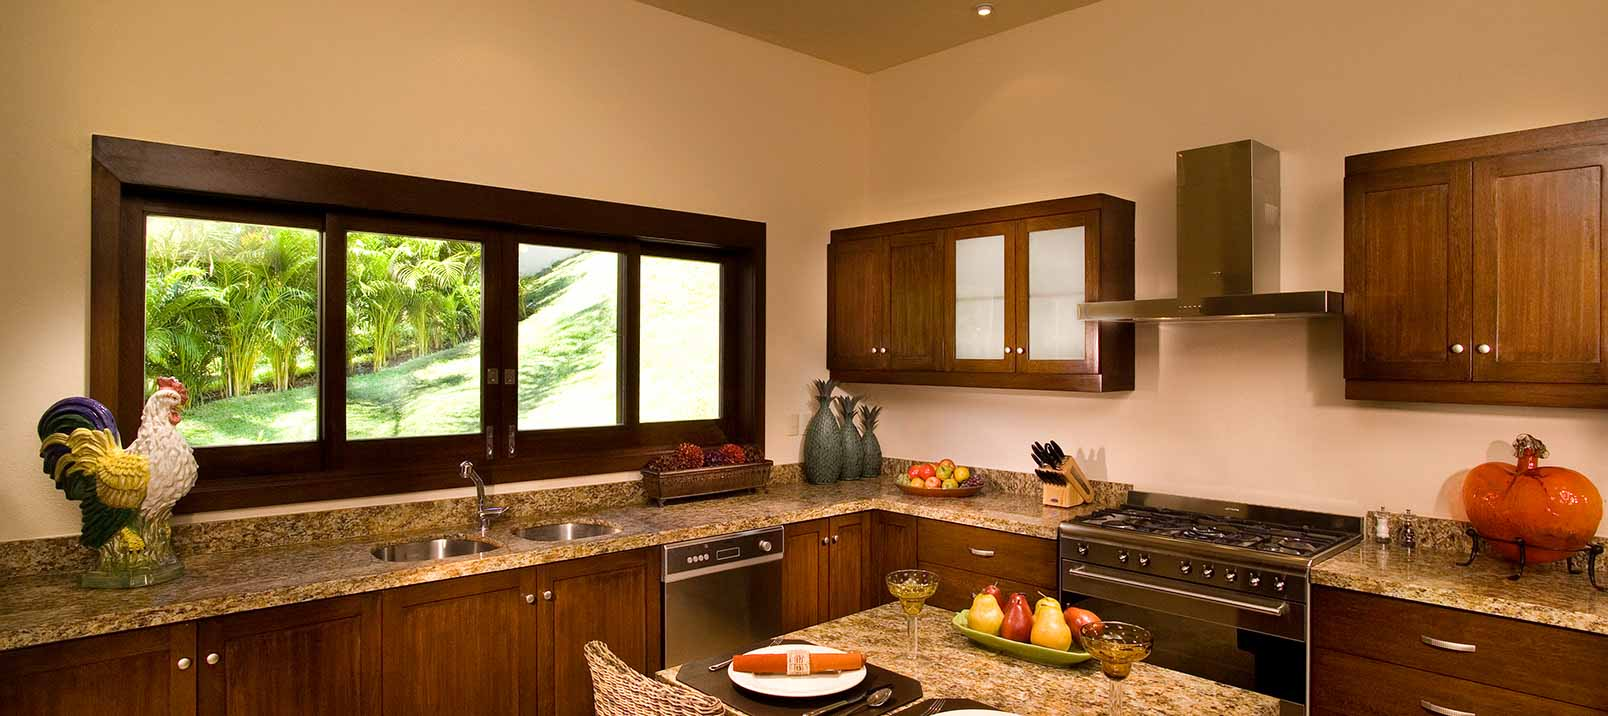 er-residence-header-disp-residence-real-del-mar-casa-del-puente-3.jpg